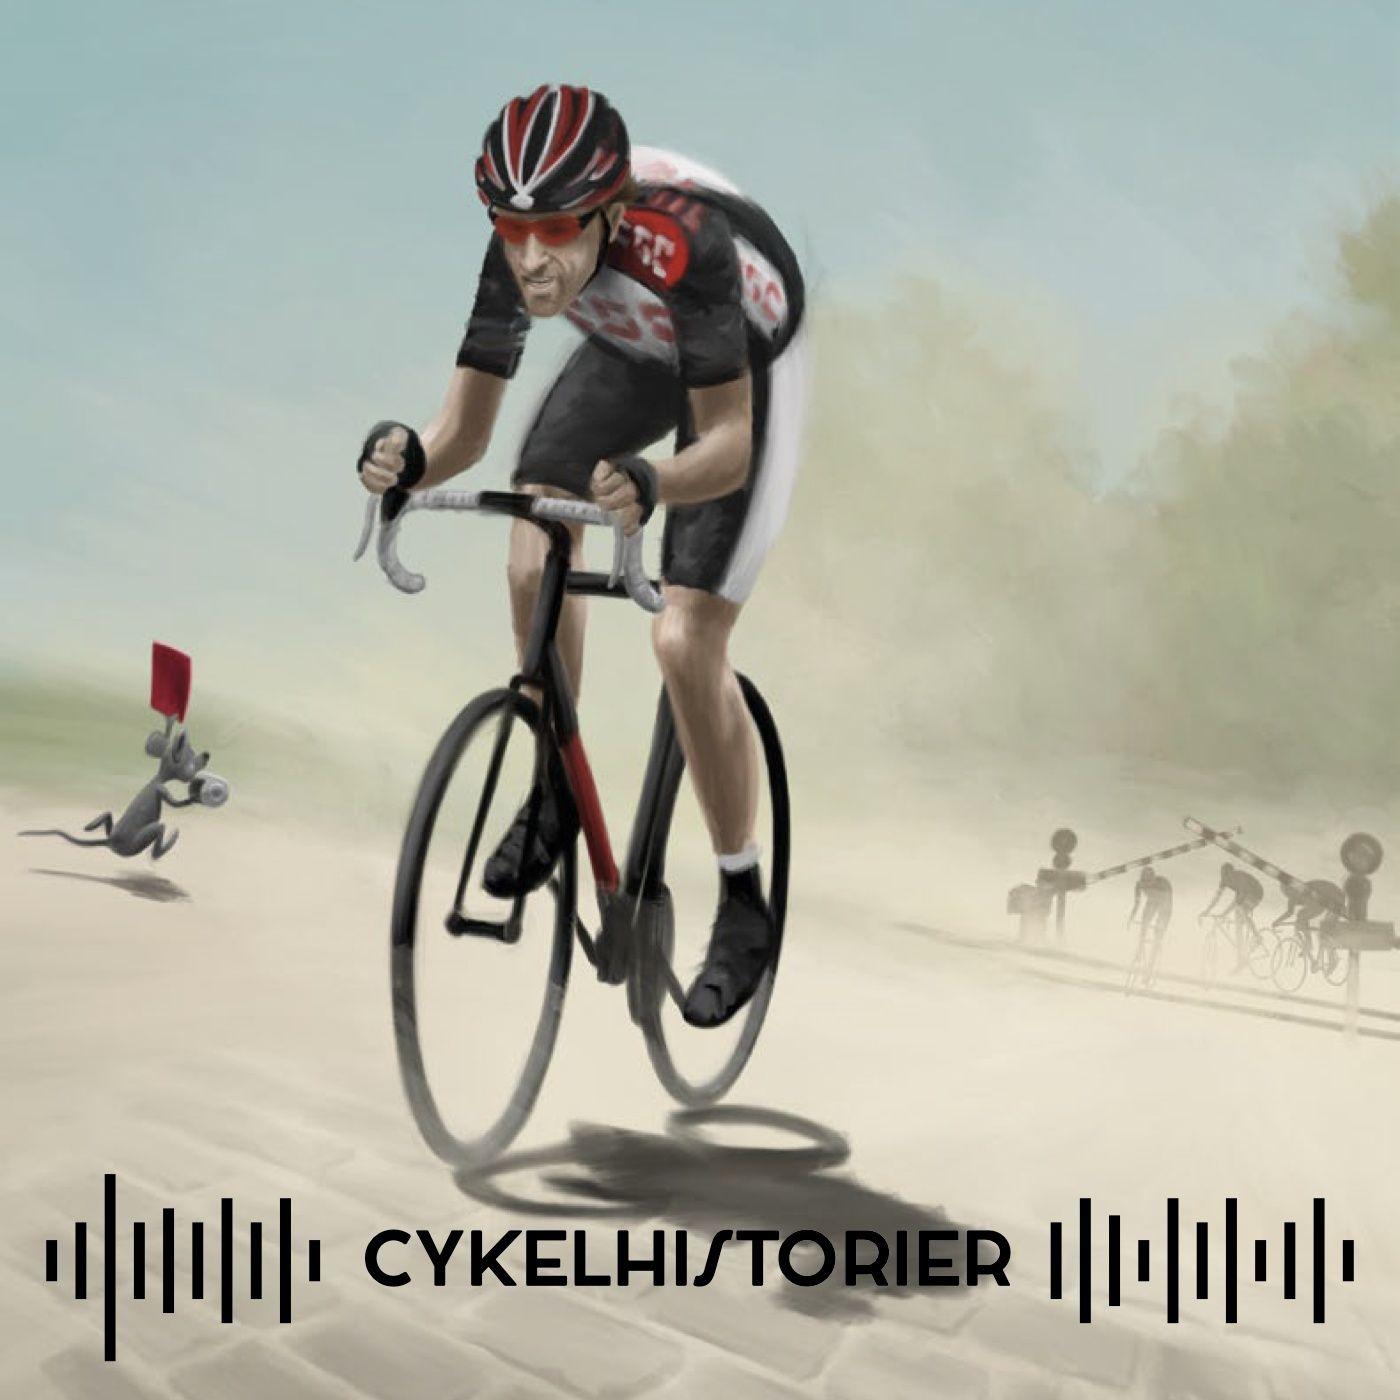 EP03 Oprøret på Brostenene · Fabian Cancellara · Paris-Roubaix 2006